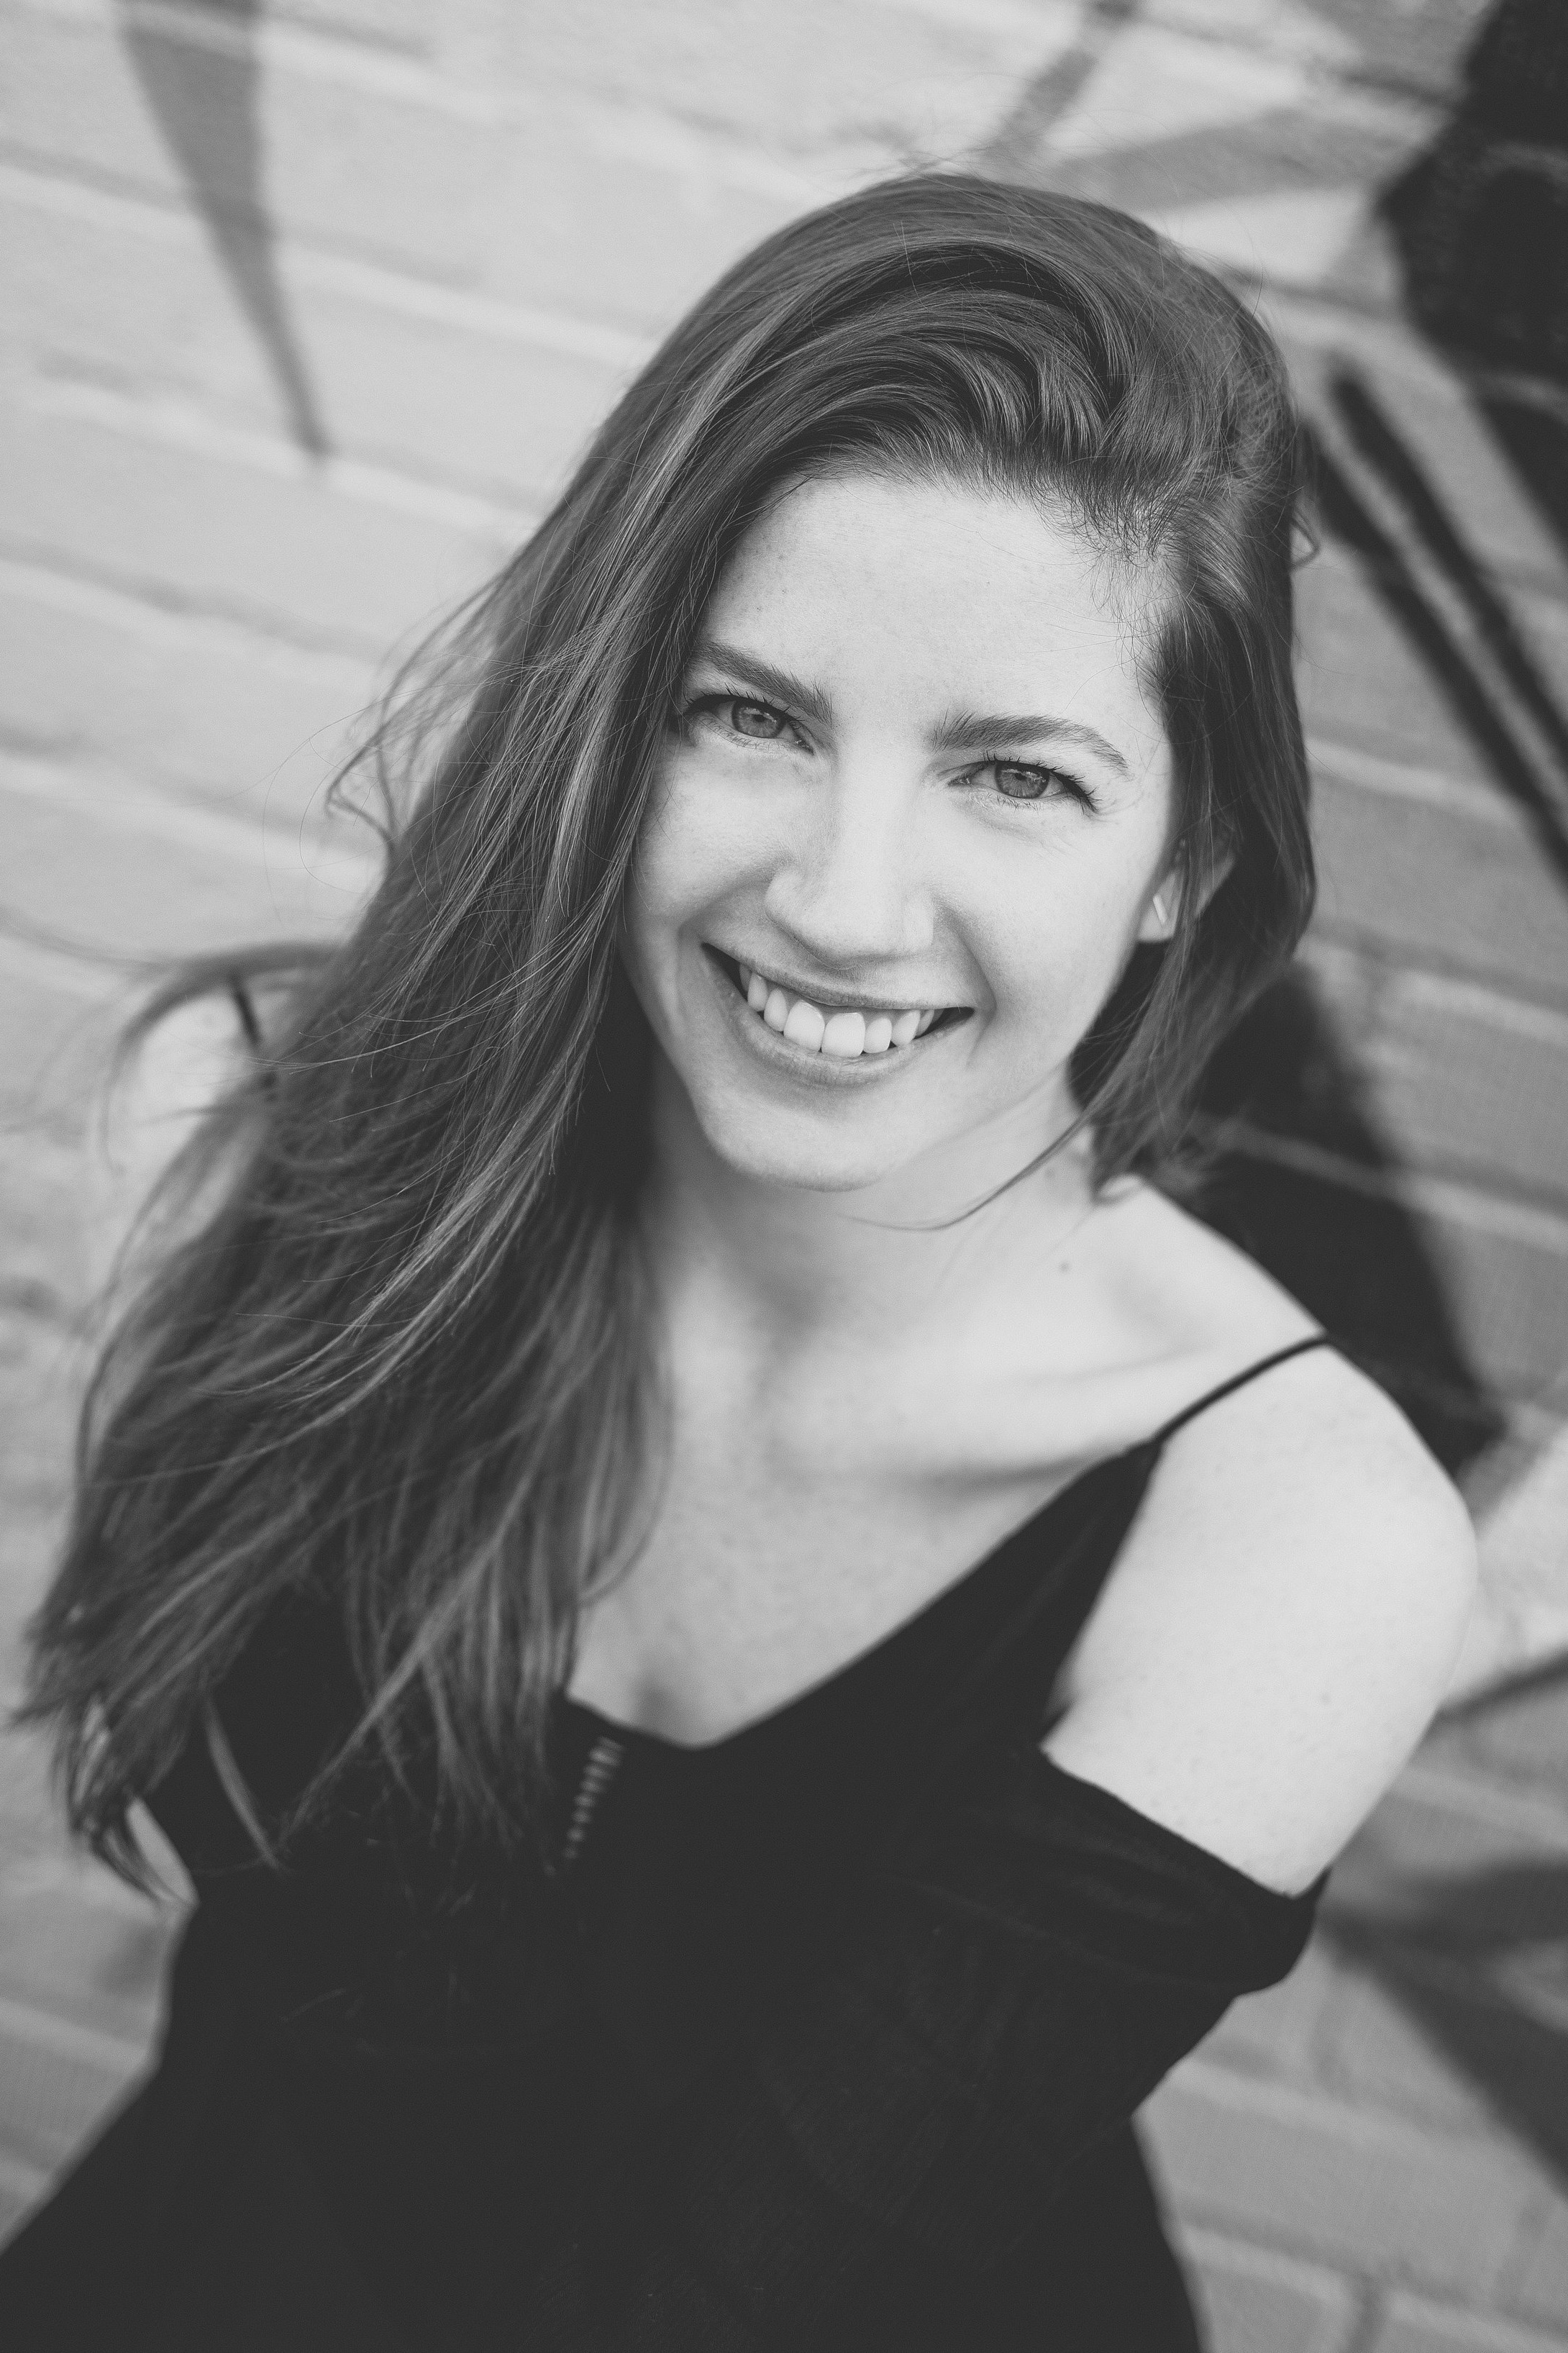 EmmaClarke+Black_white+Headshot.jpg